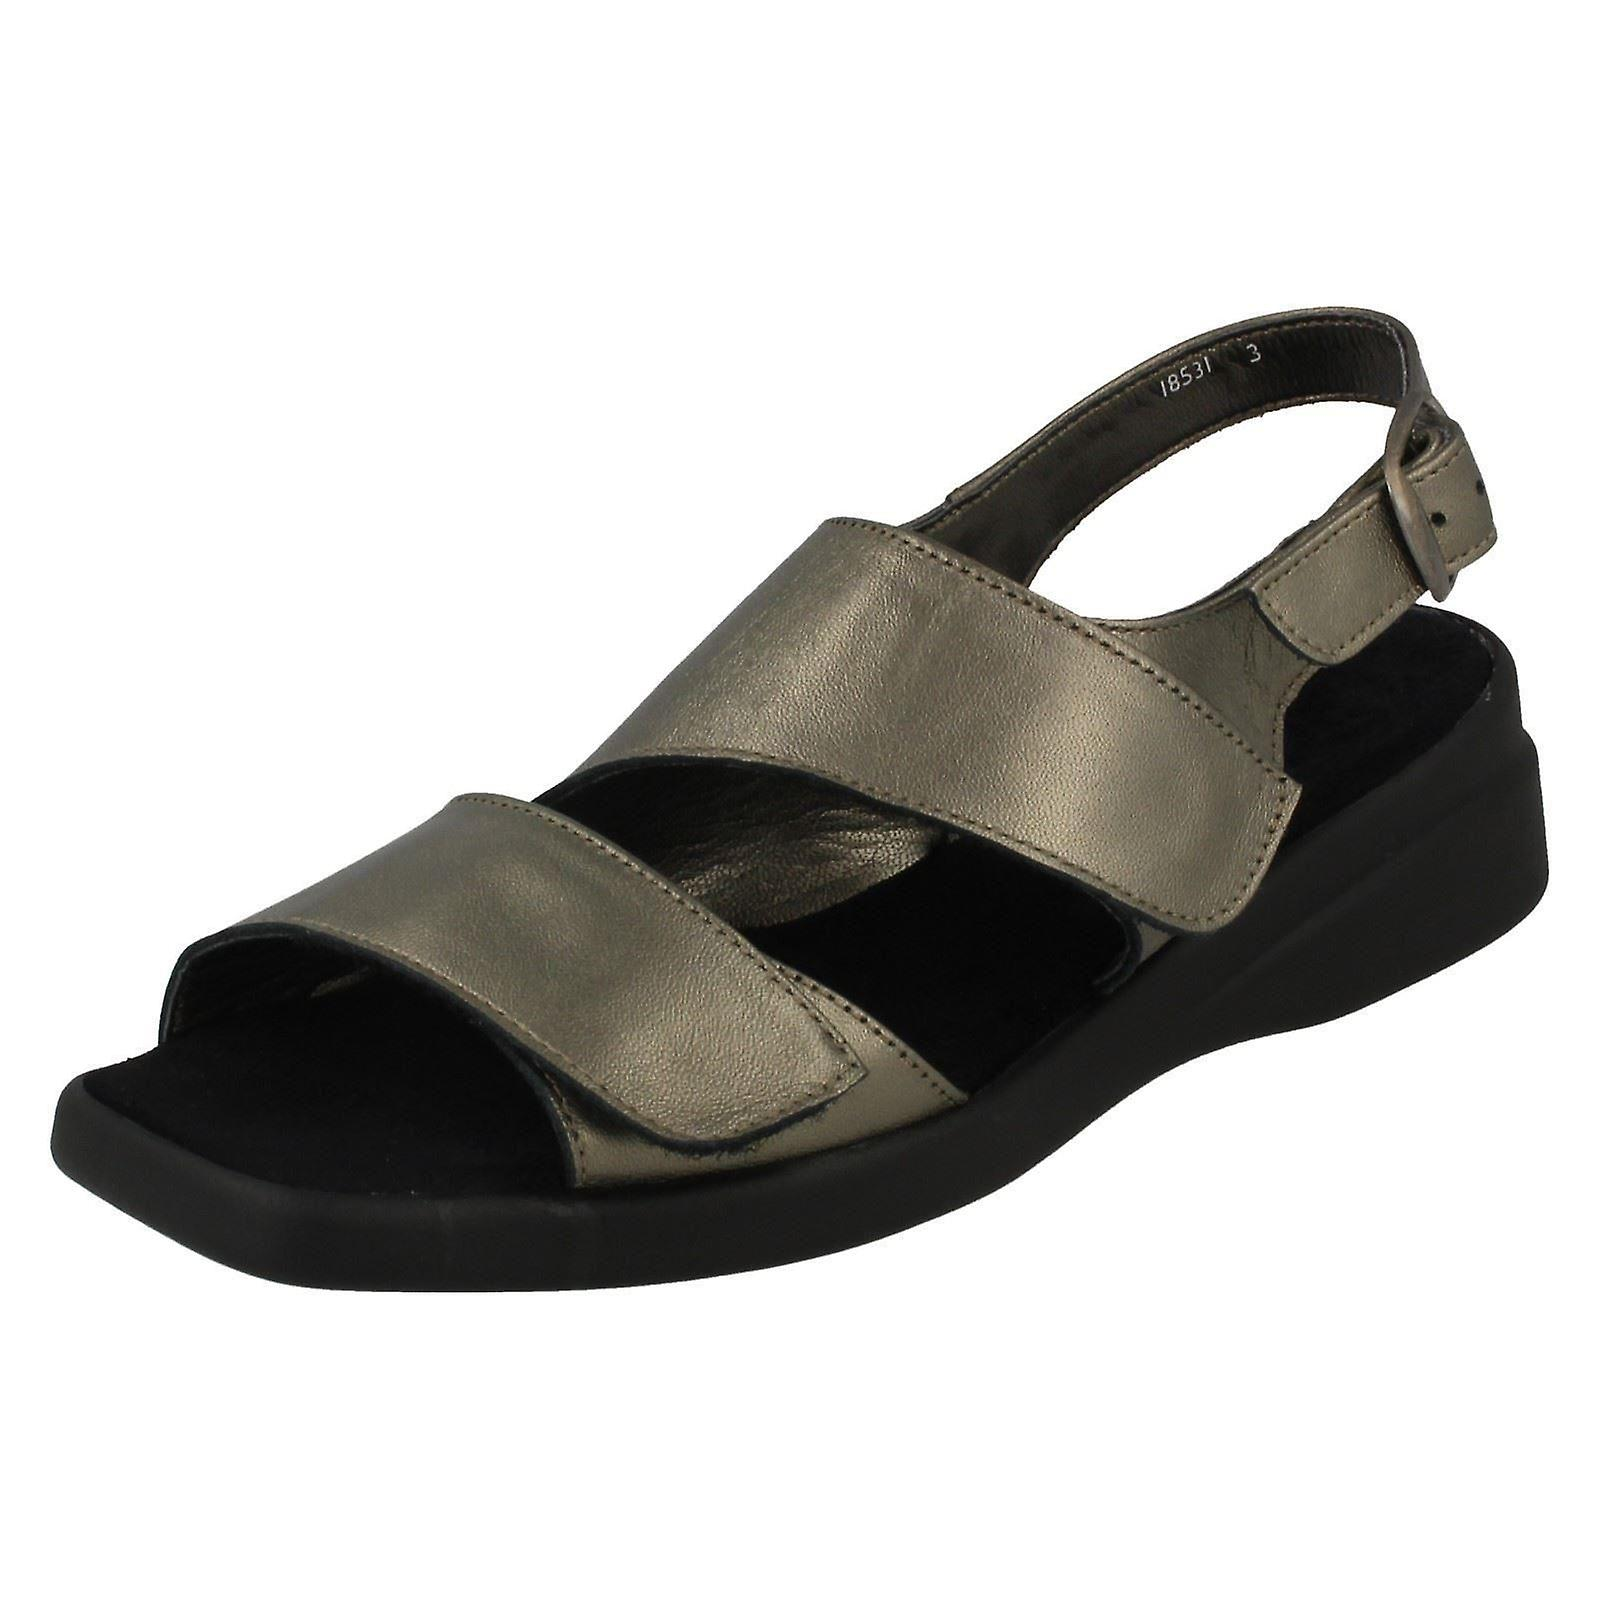 Ladies Nil Simile Narrow Fitting Leather Sandal Devon qUmrV